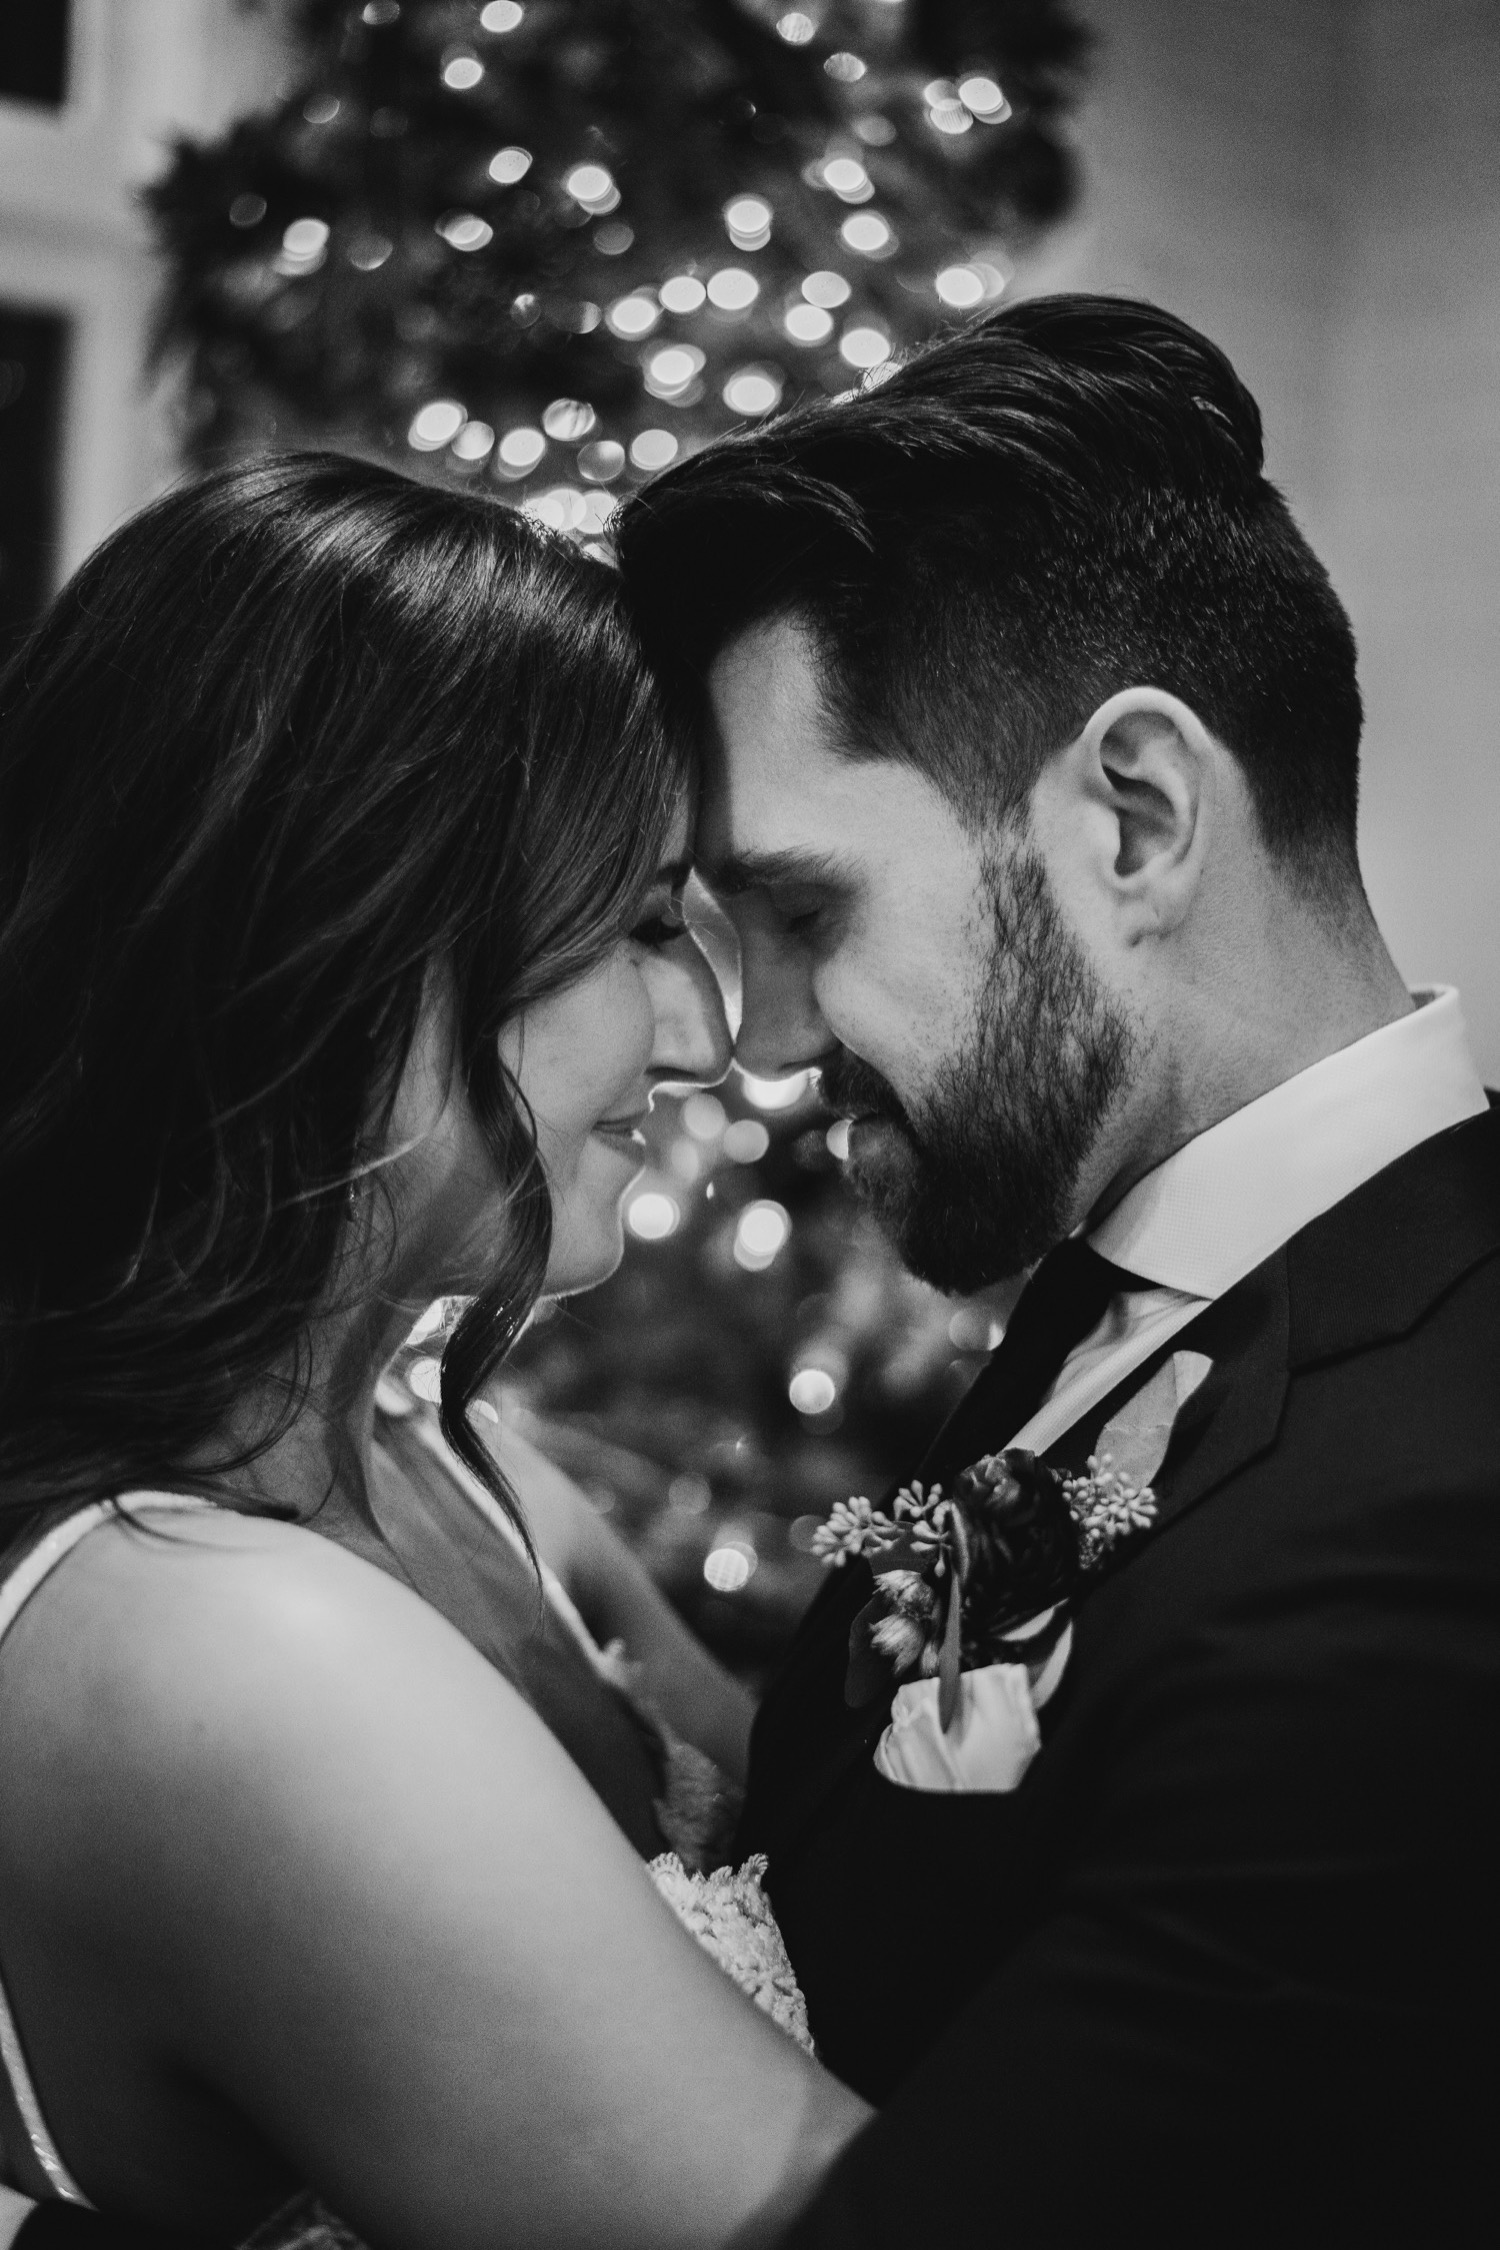 084_Haavig_Danada-Christmas-December-Wedding_0148_Decemberwedding_DanadaHouse_DanadaHouseWedding_Chicagowedding_ChristmasWedding.jpg